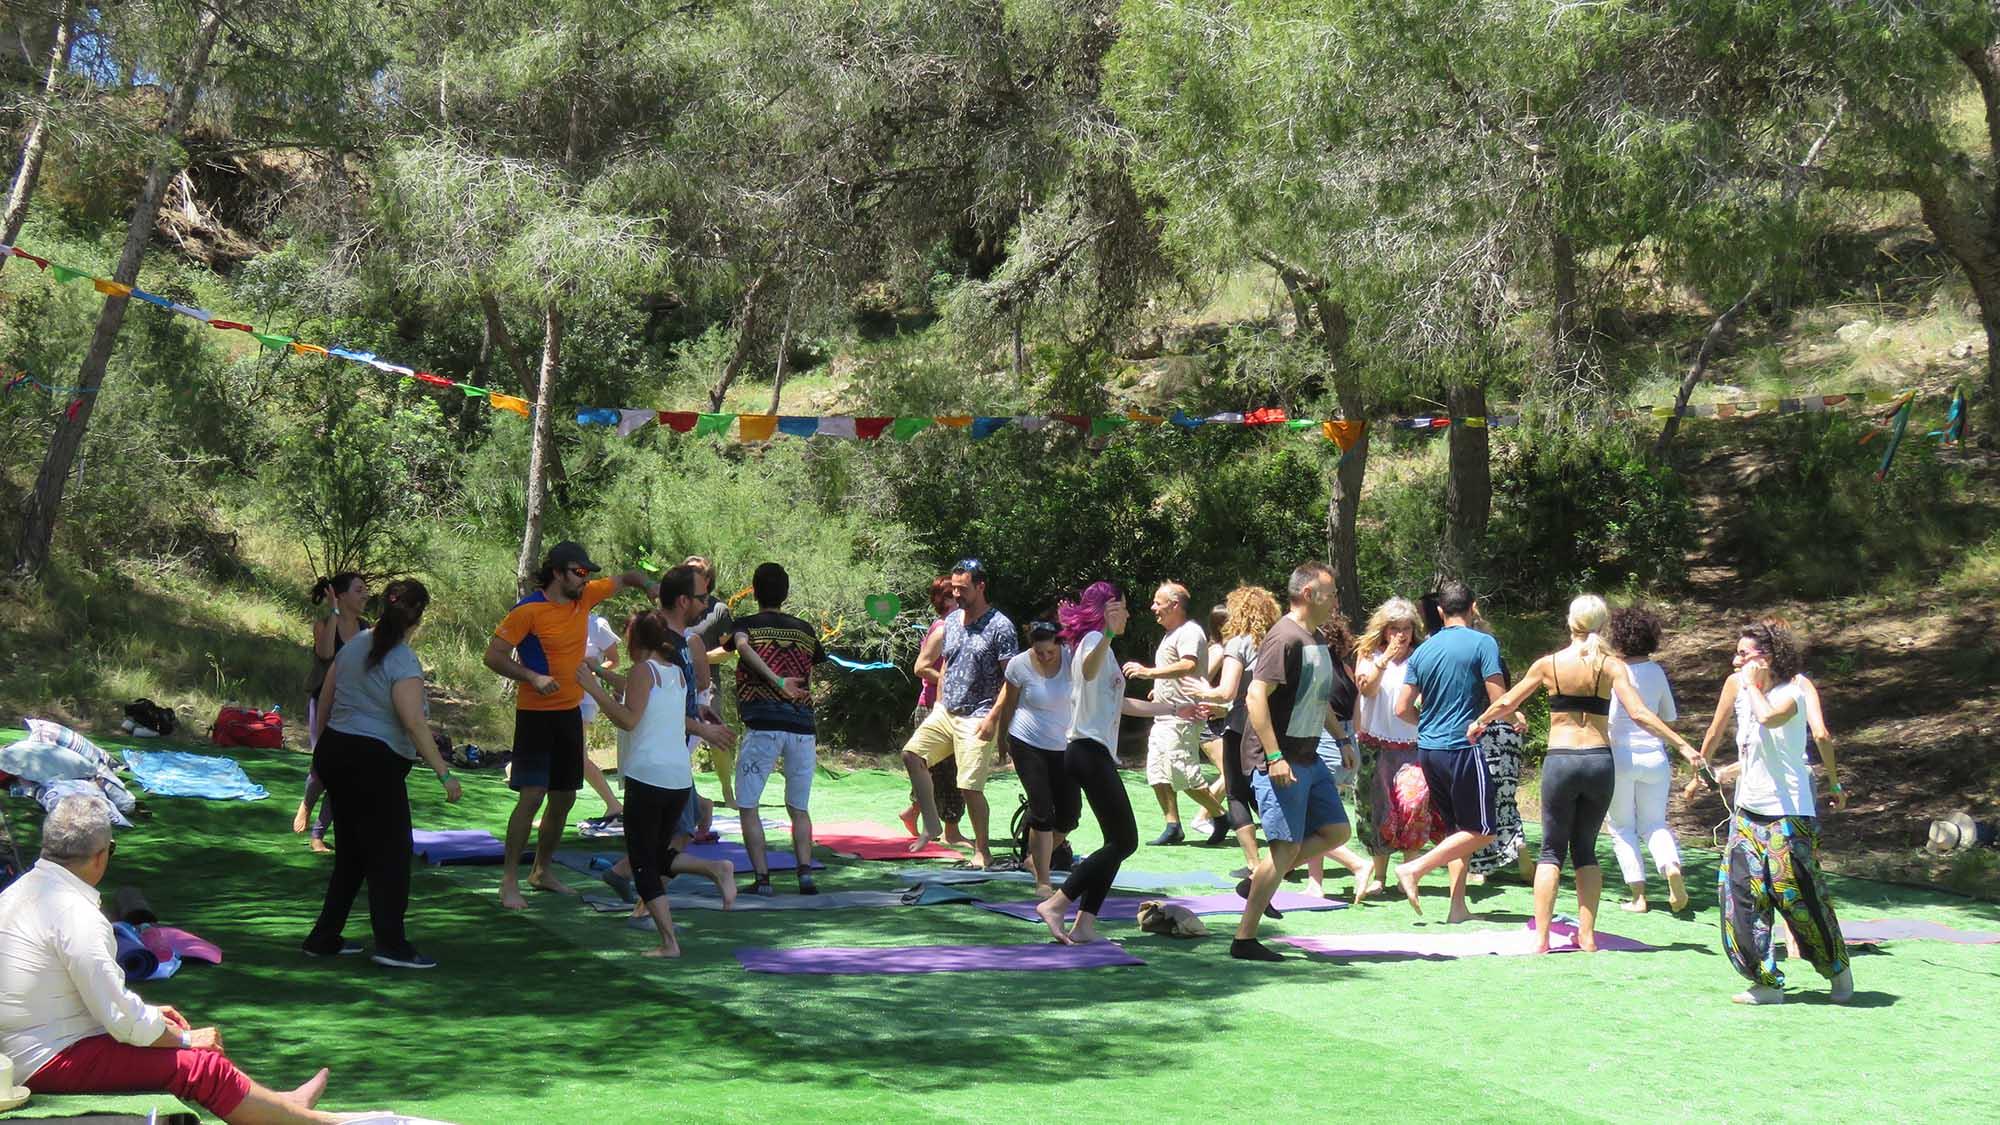 Mother Earth Festival raises more than 3,700 euros